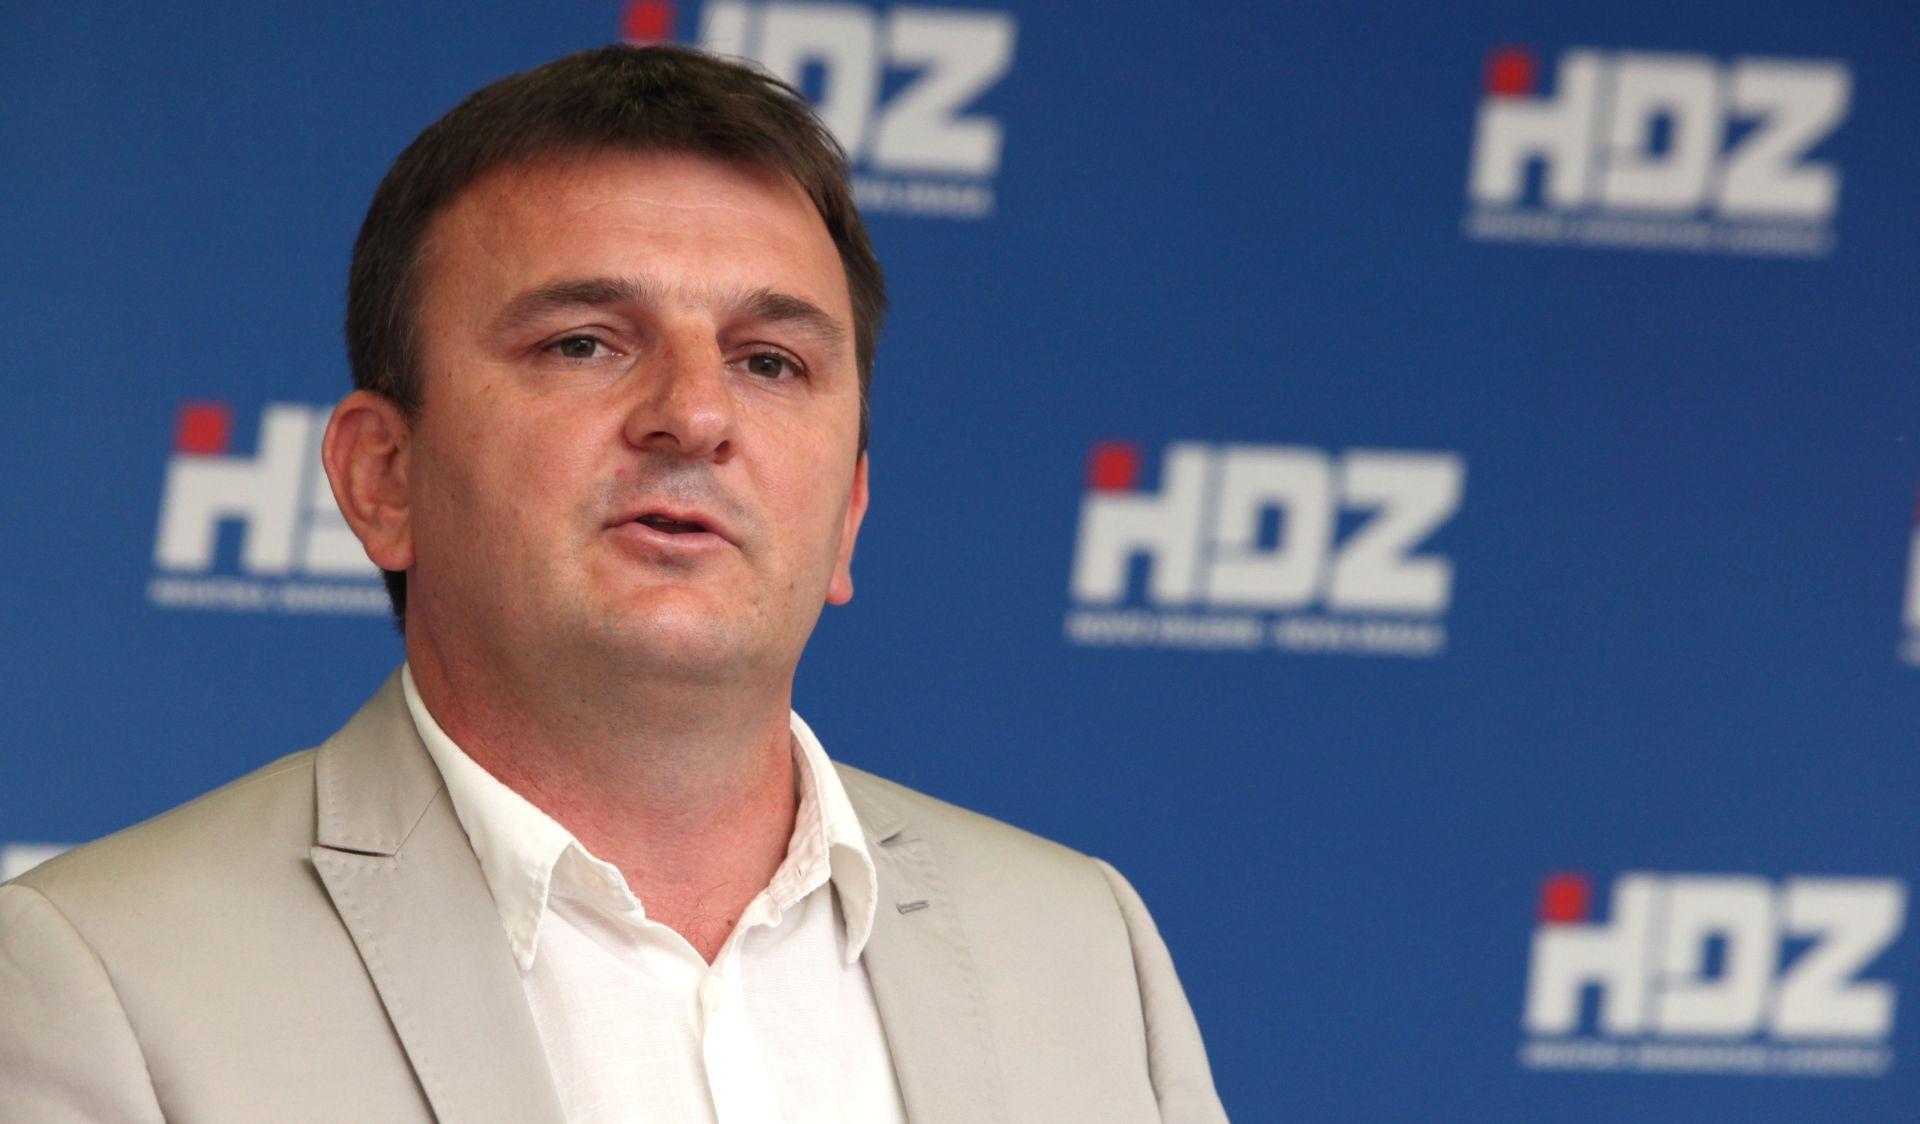 Splitski HDZ podržava Andreja Plenkovića